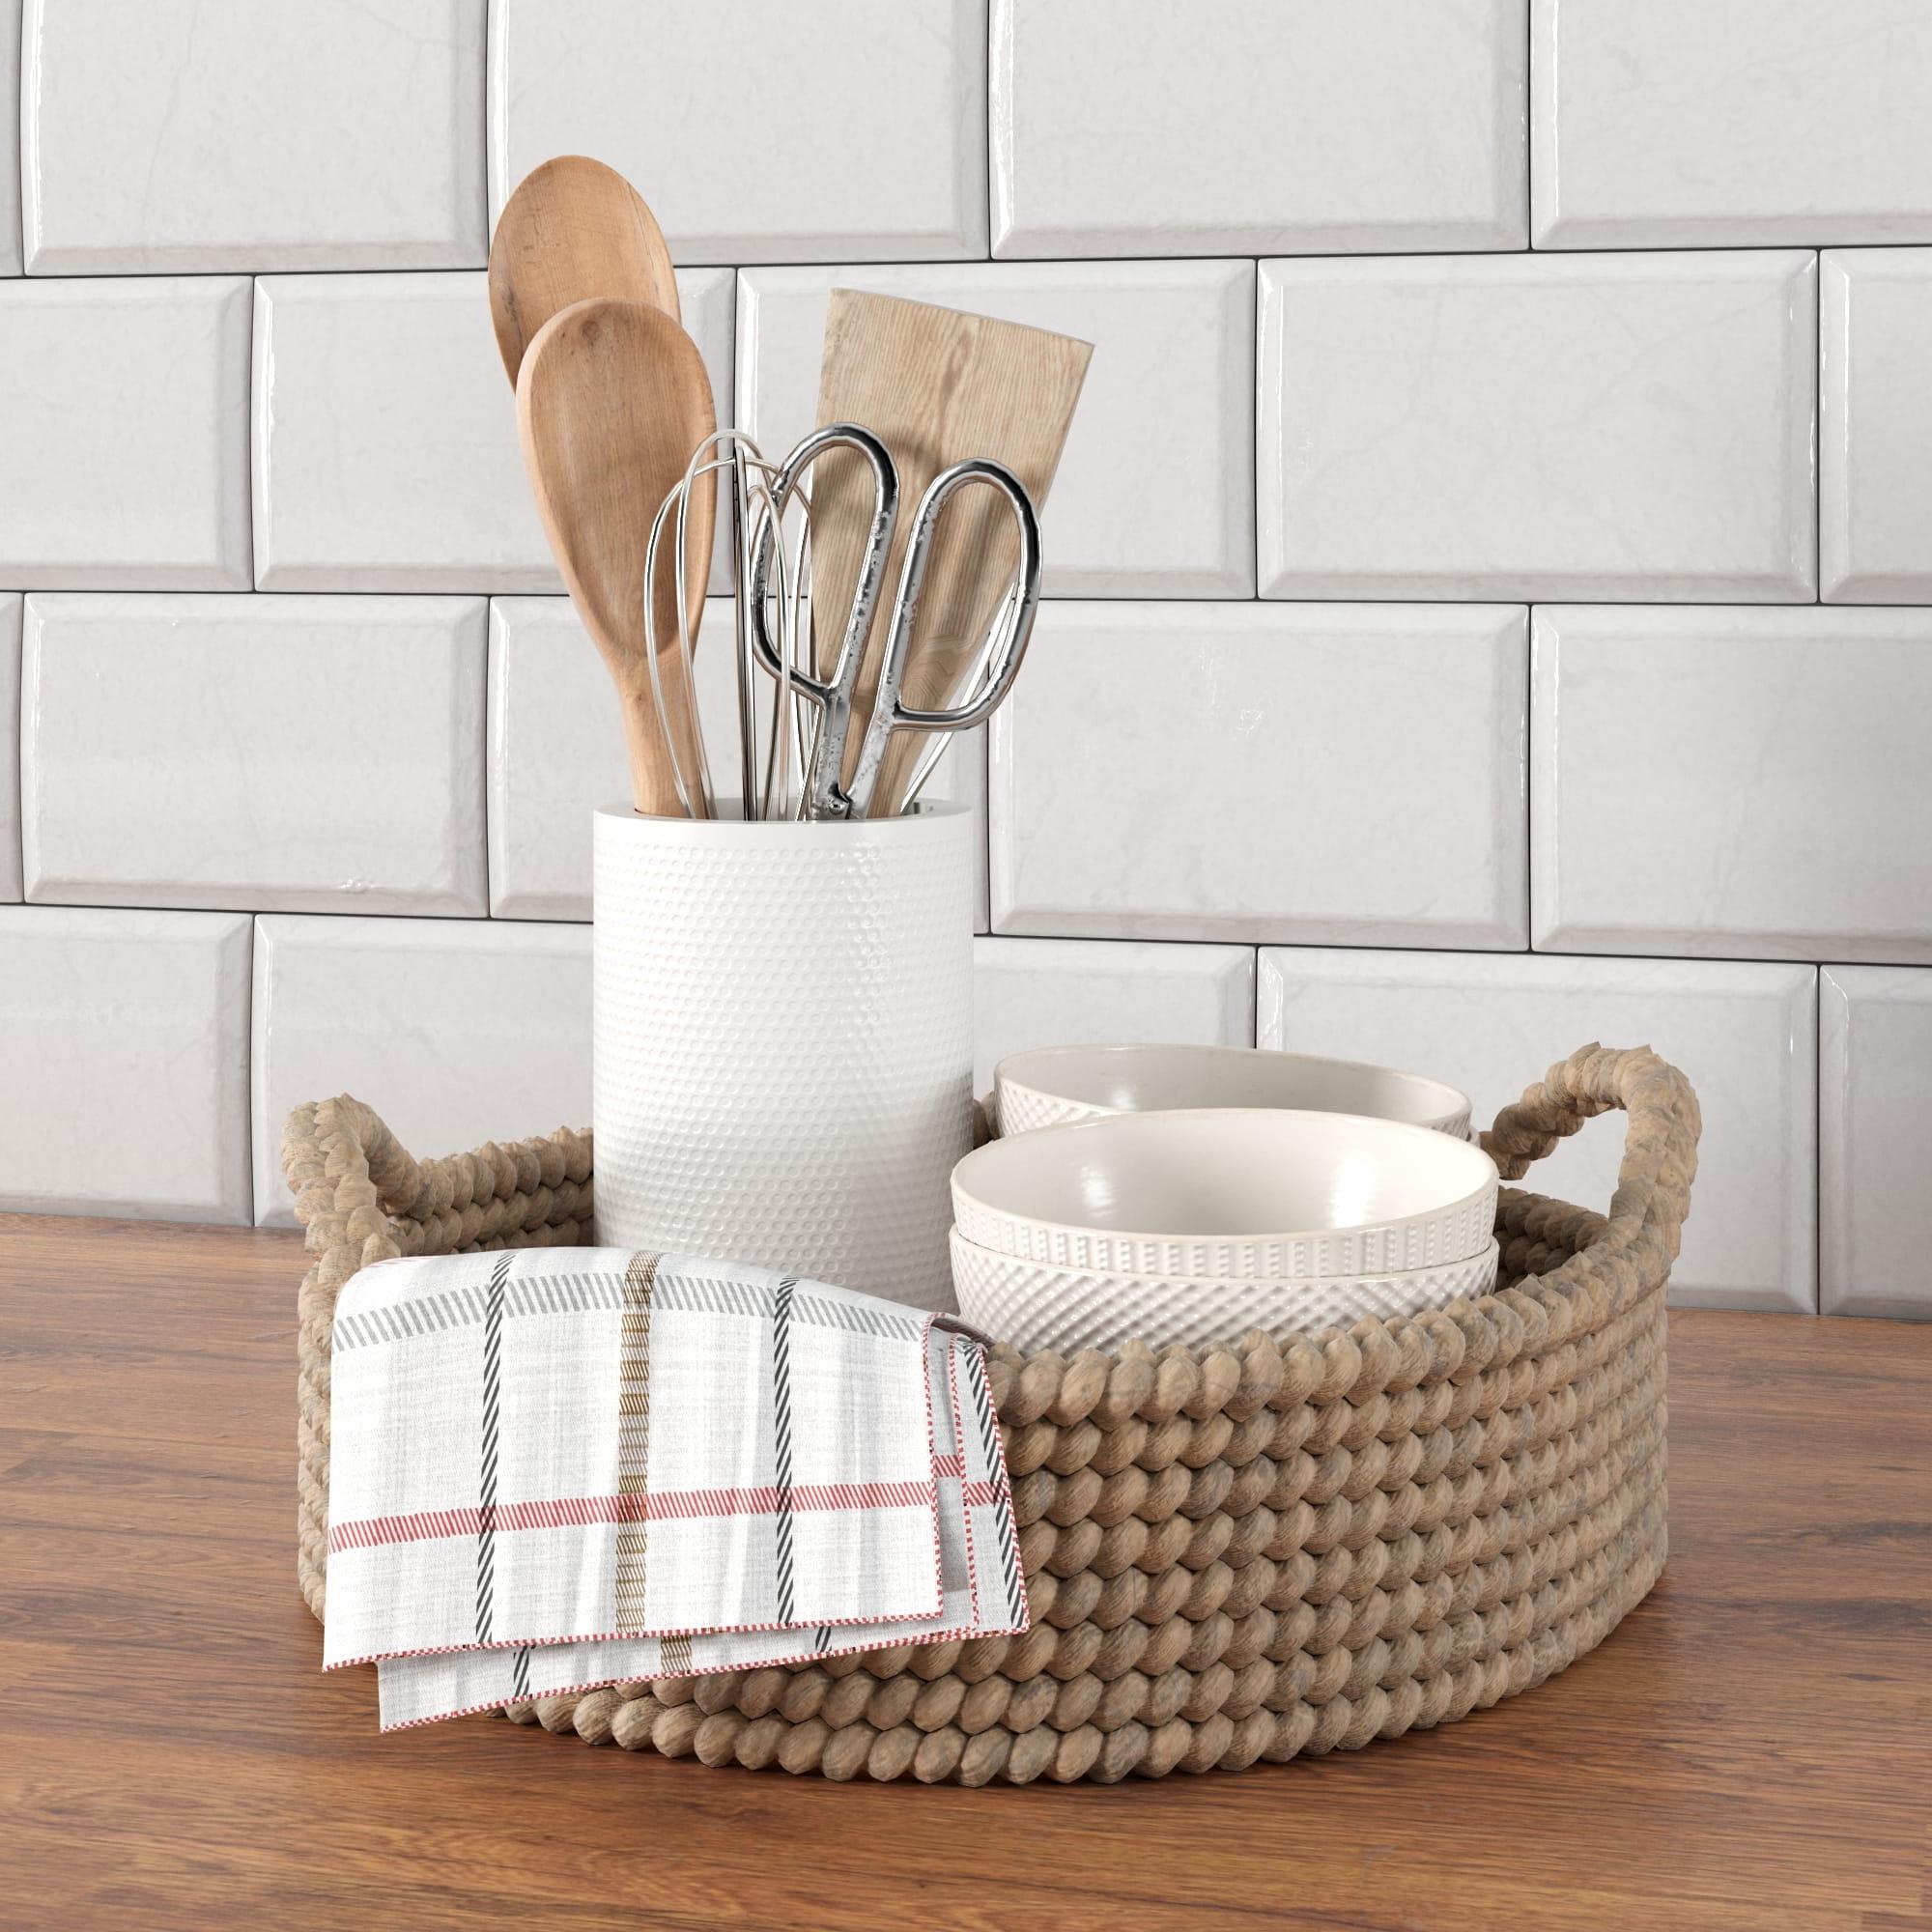 kitchen props 31 AM231 Archmodels